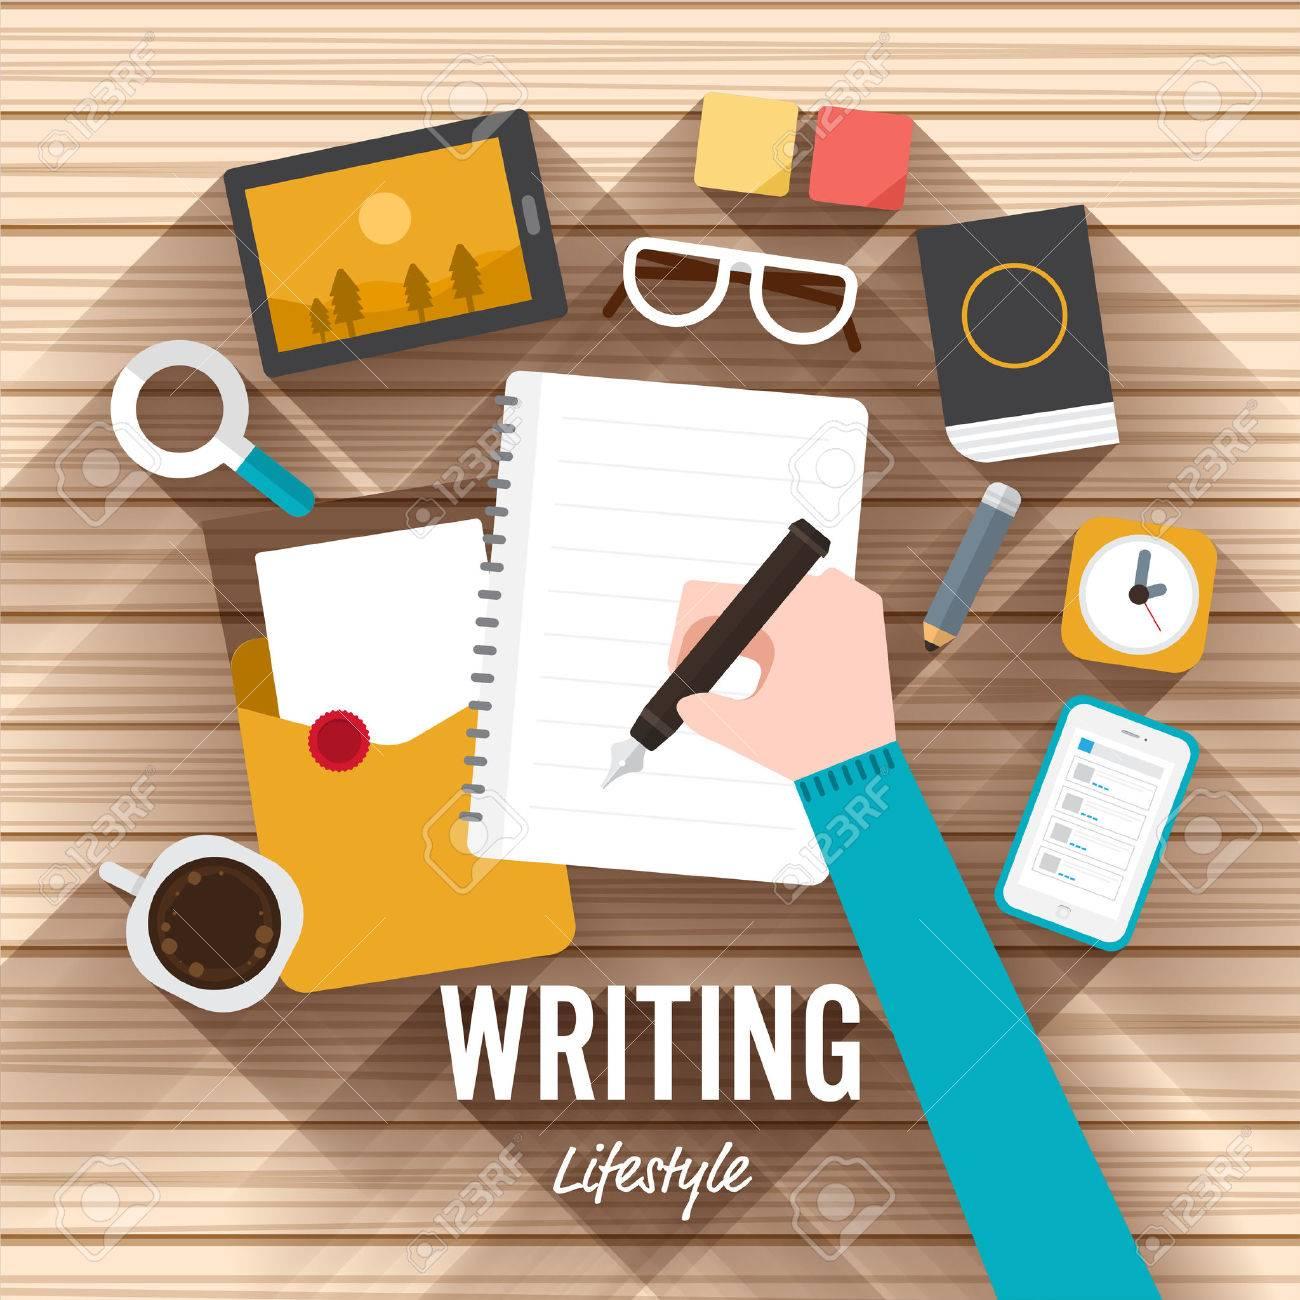 Article writings